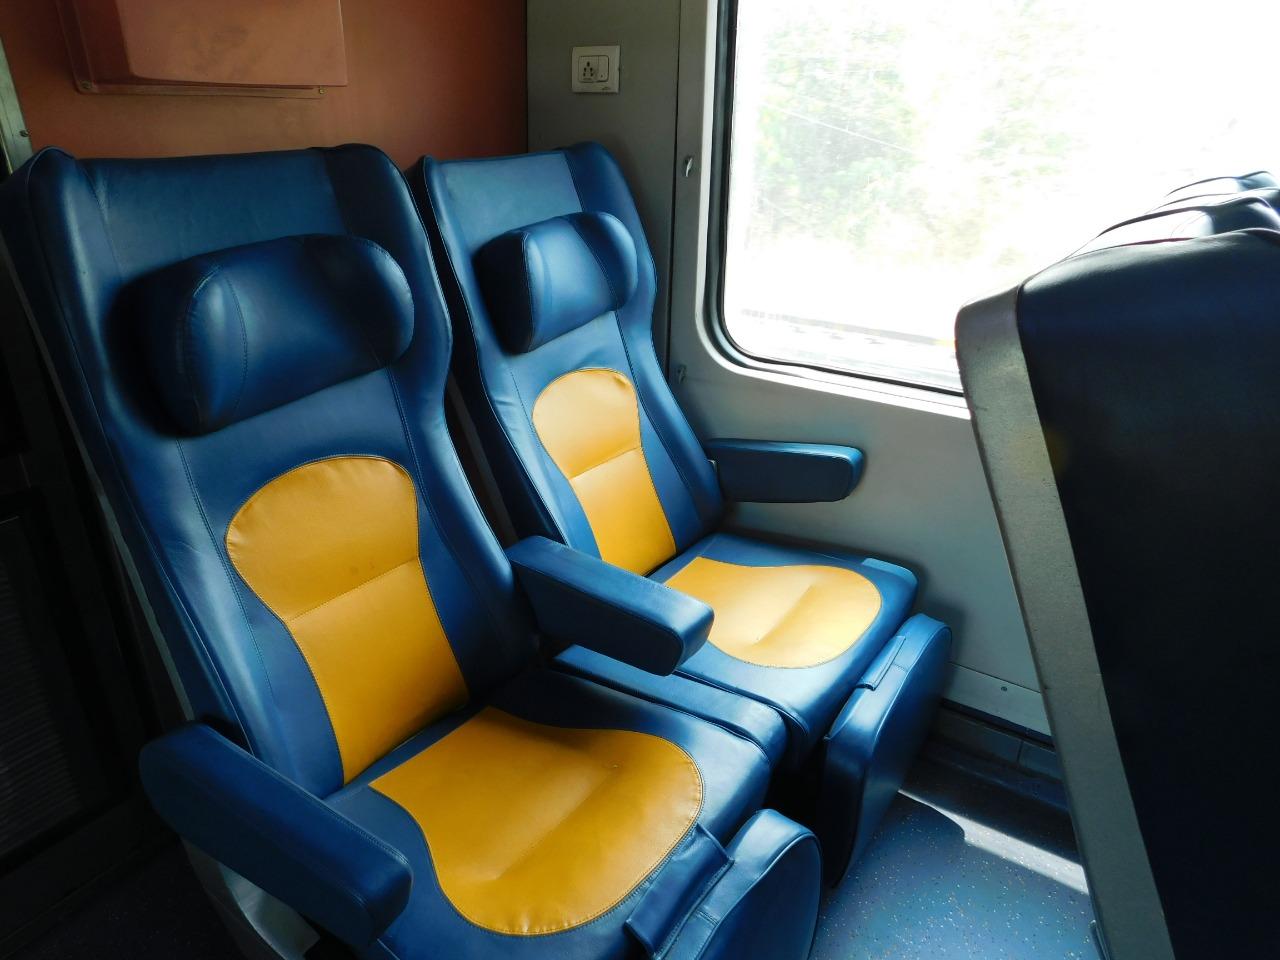 Tejas Express Seating Arrangement